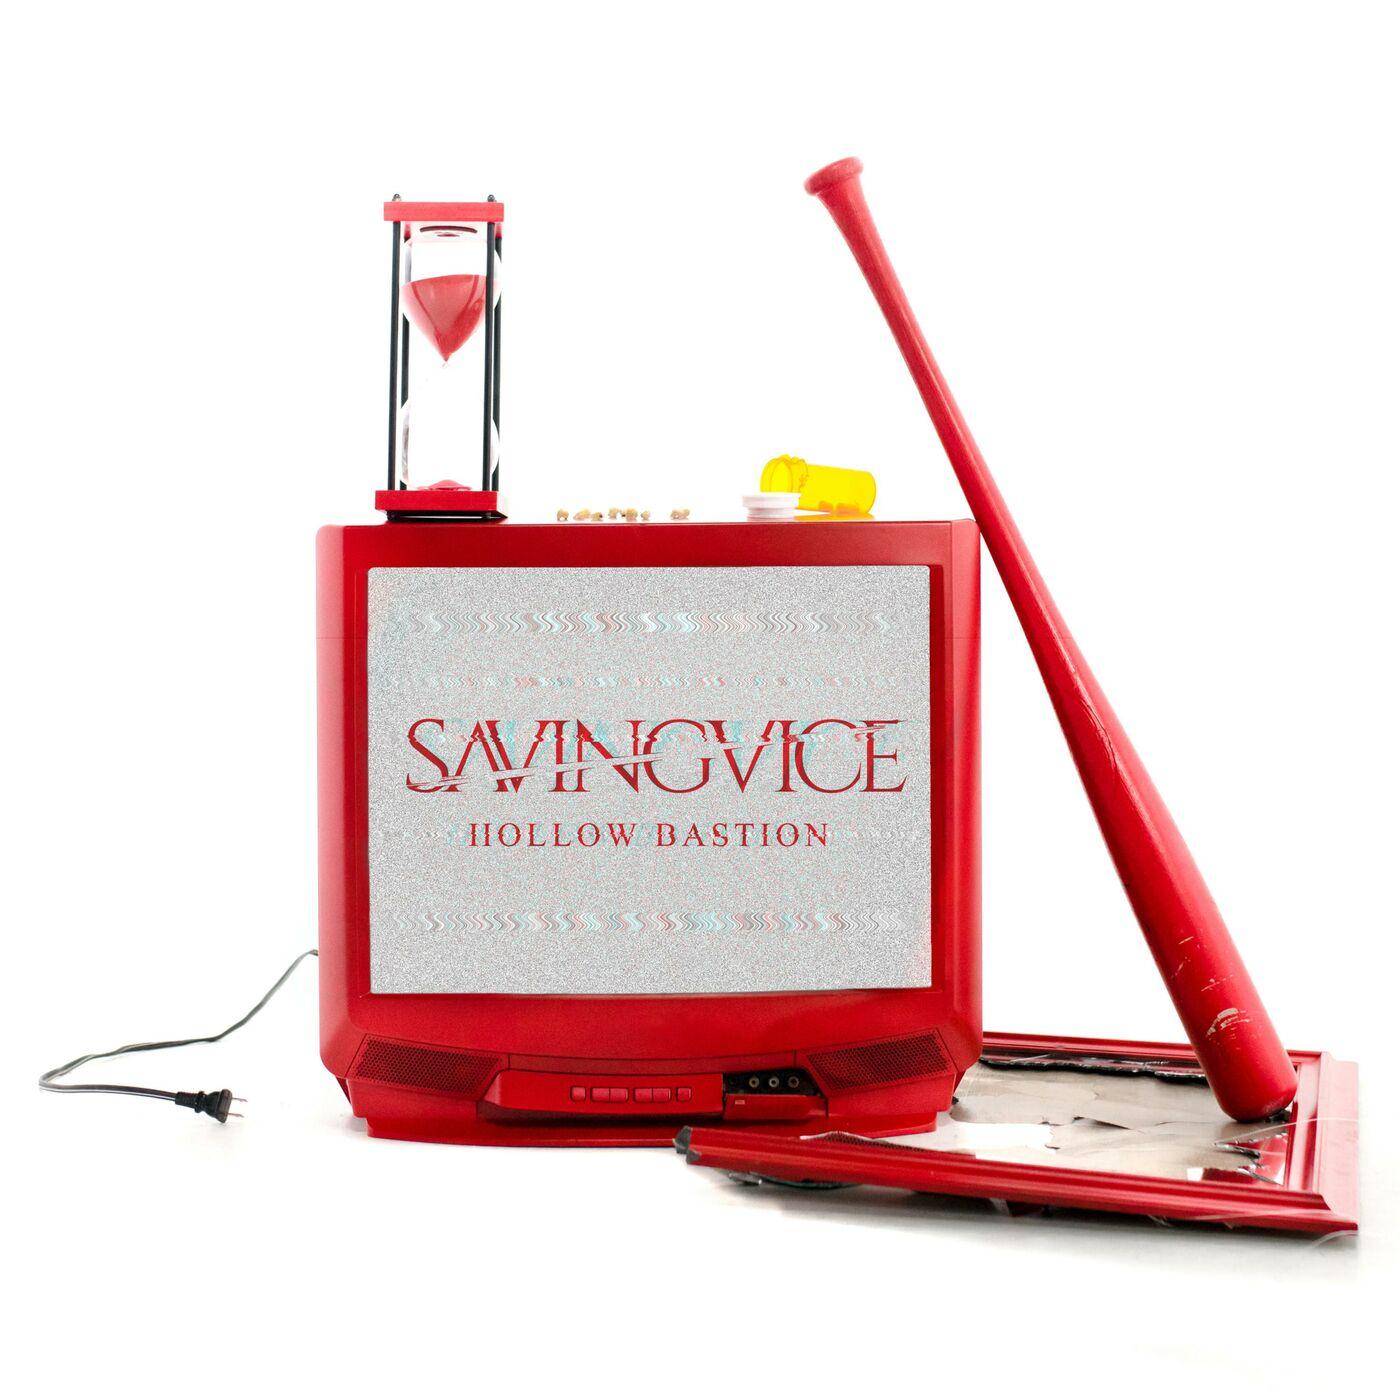 Saving Vice - Hollow Bastion [single] (2019)